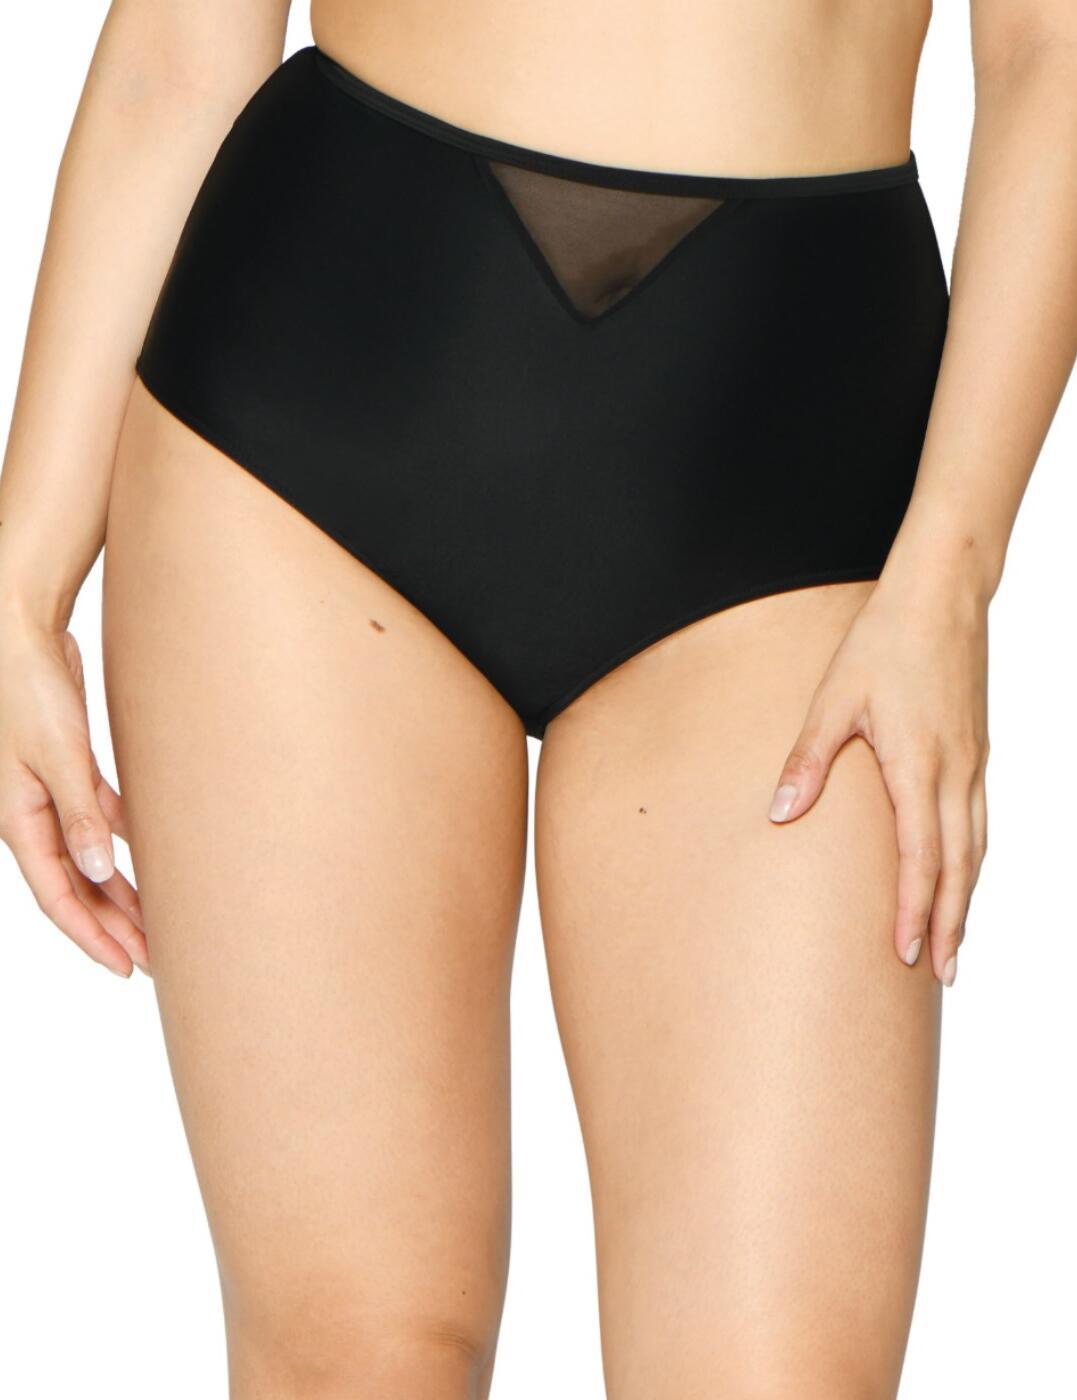 CS001505 Curvy Kate Sheer Class High Waist Bikini Brief - CS001505 Black